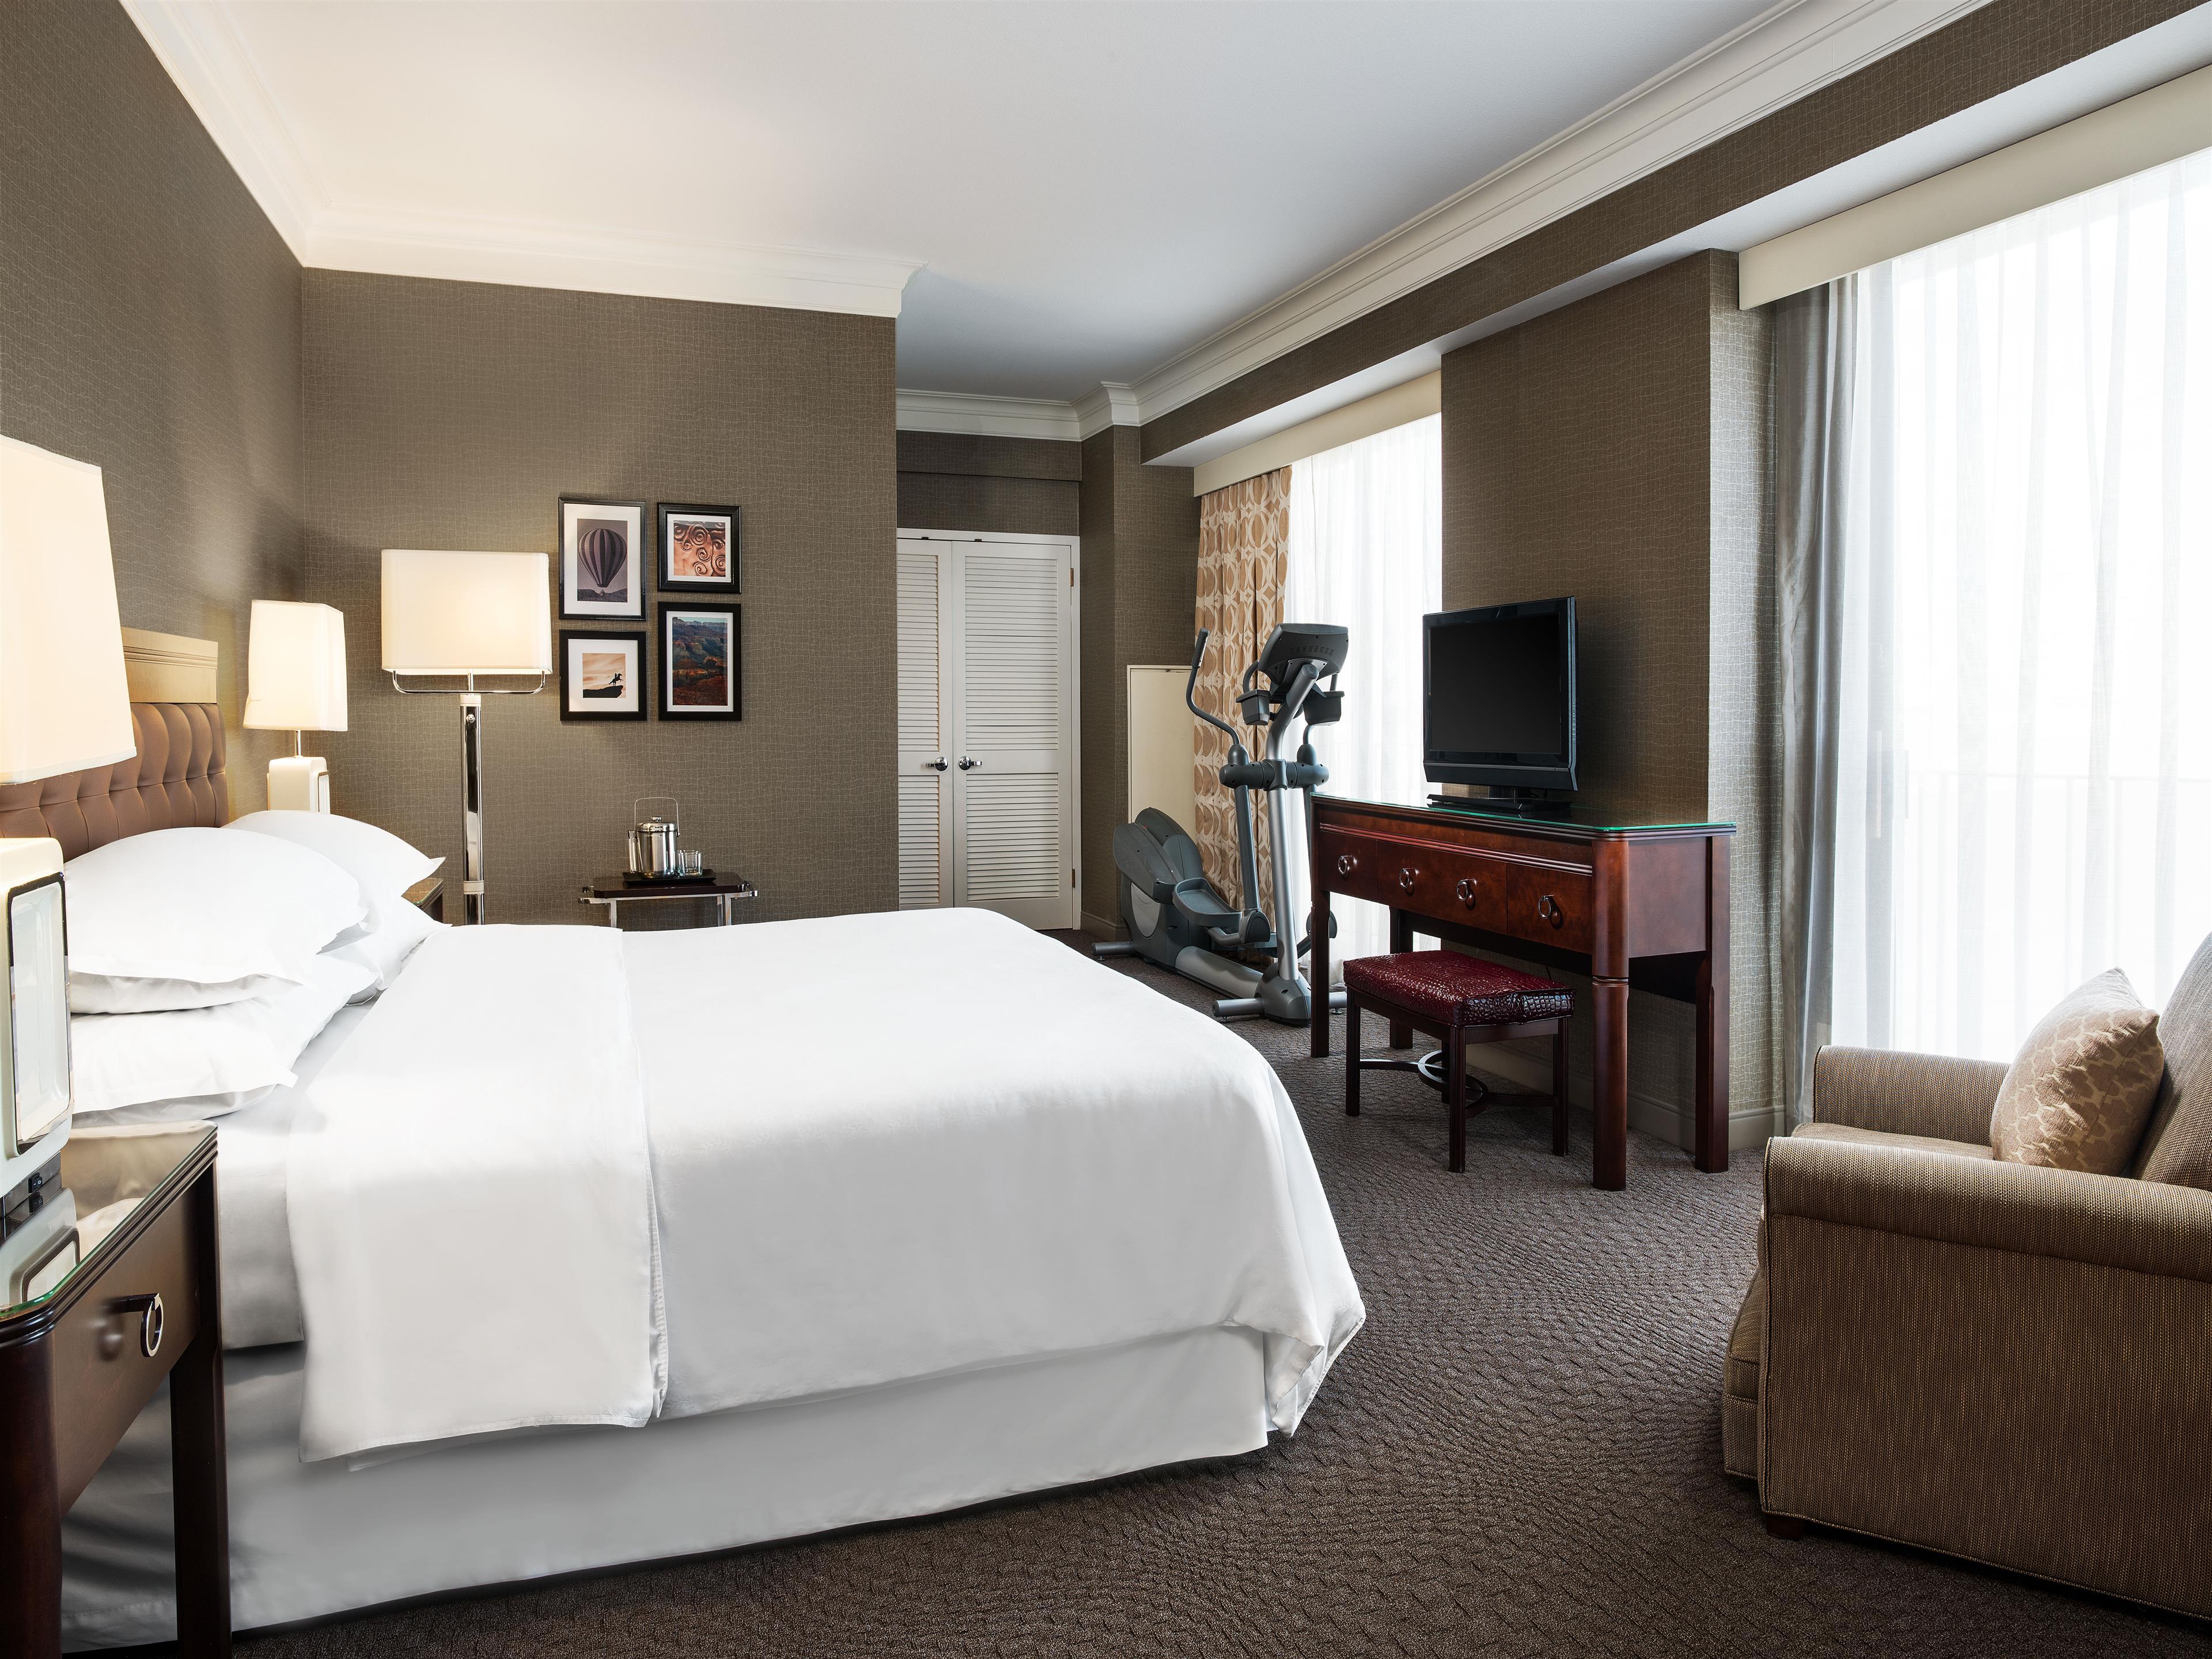 Sheraton Crescent Hotel image 3